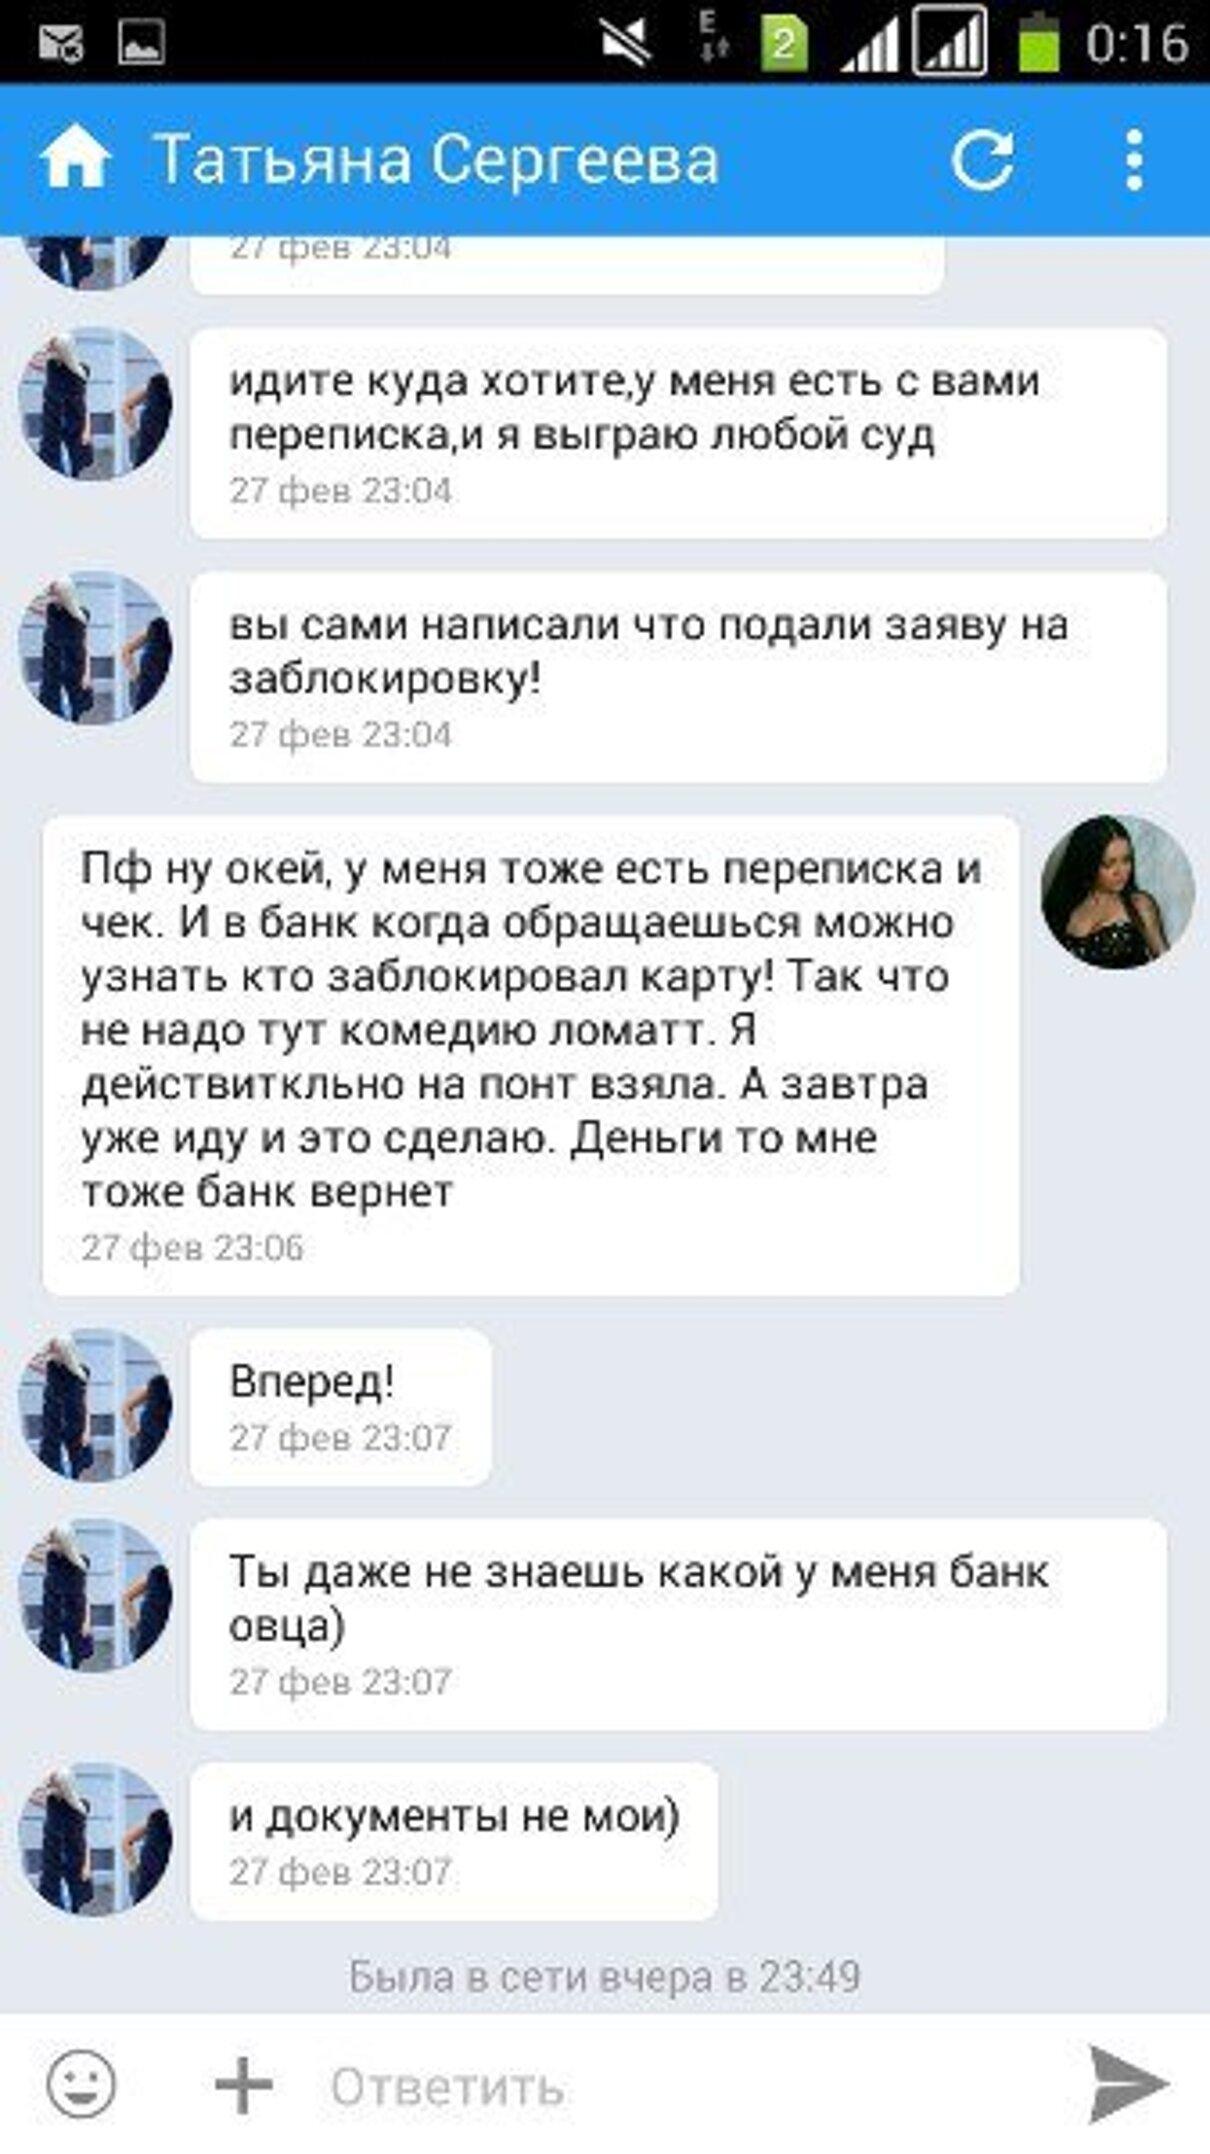 Жалоба-отзыв: 4188373027305108 Татьяна Проснякова - Мошенница.  Фото №4